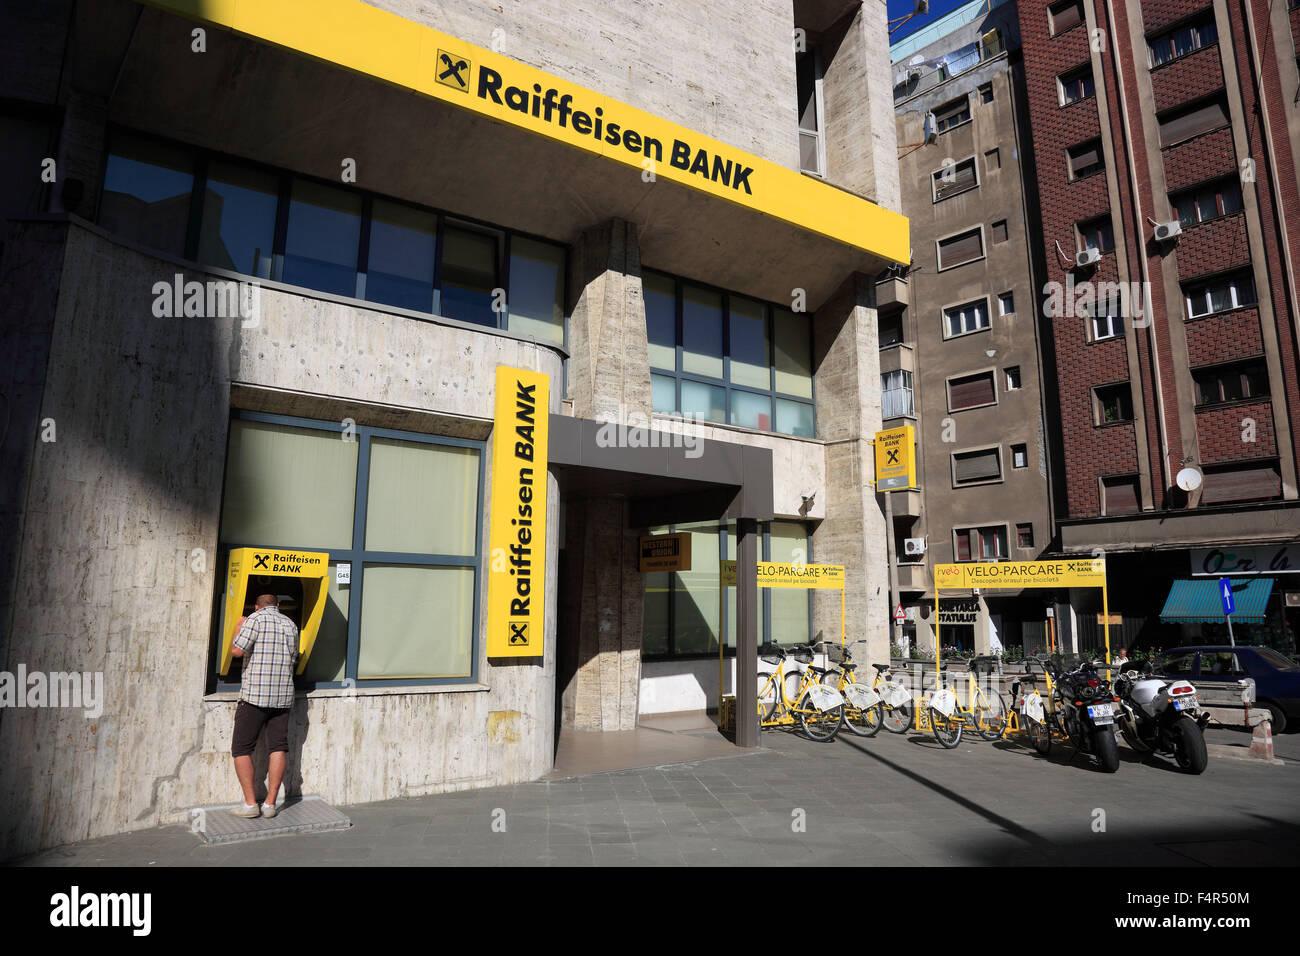 Raiffeisen Bank Romania Address